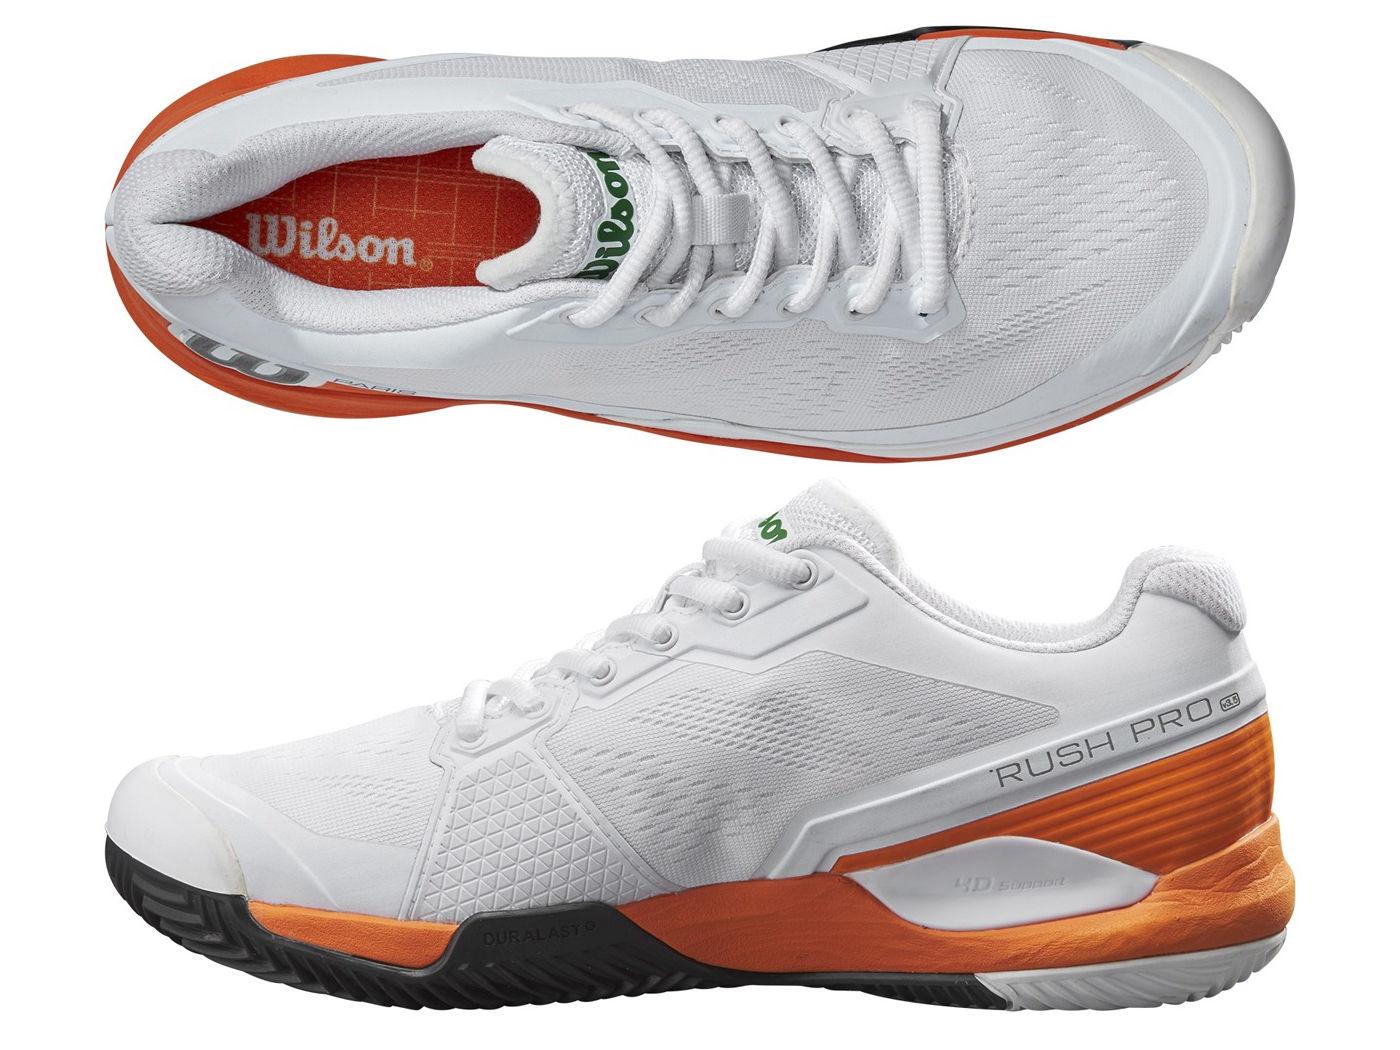 Giày tennis nữ Wilson WRS327730